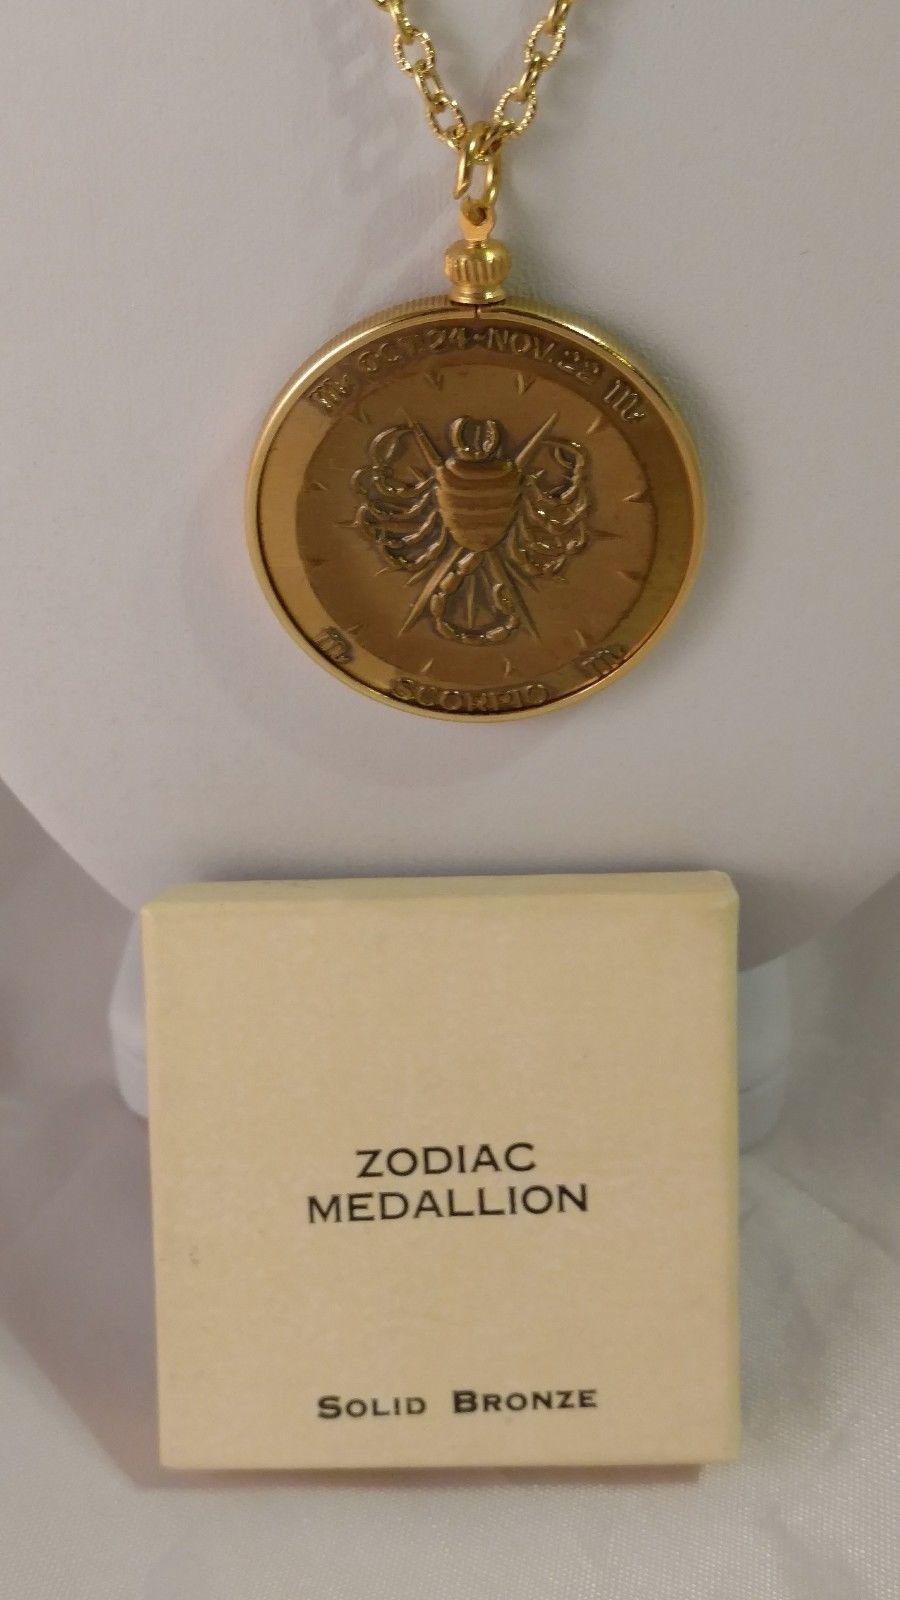 SCORPIO Zodiac Medallion Solid Bronze with Chain Necklace - also Bicentennial